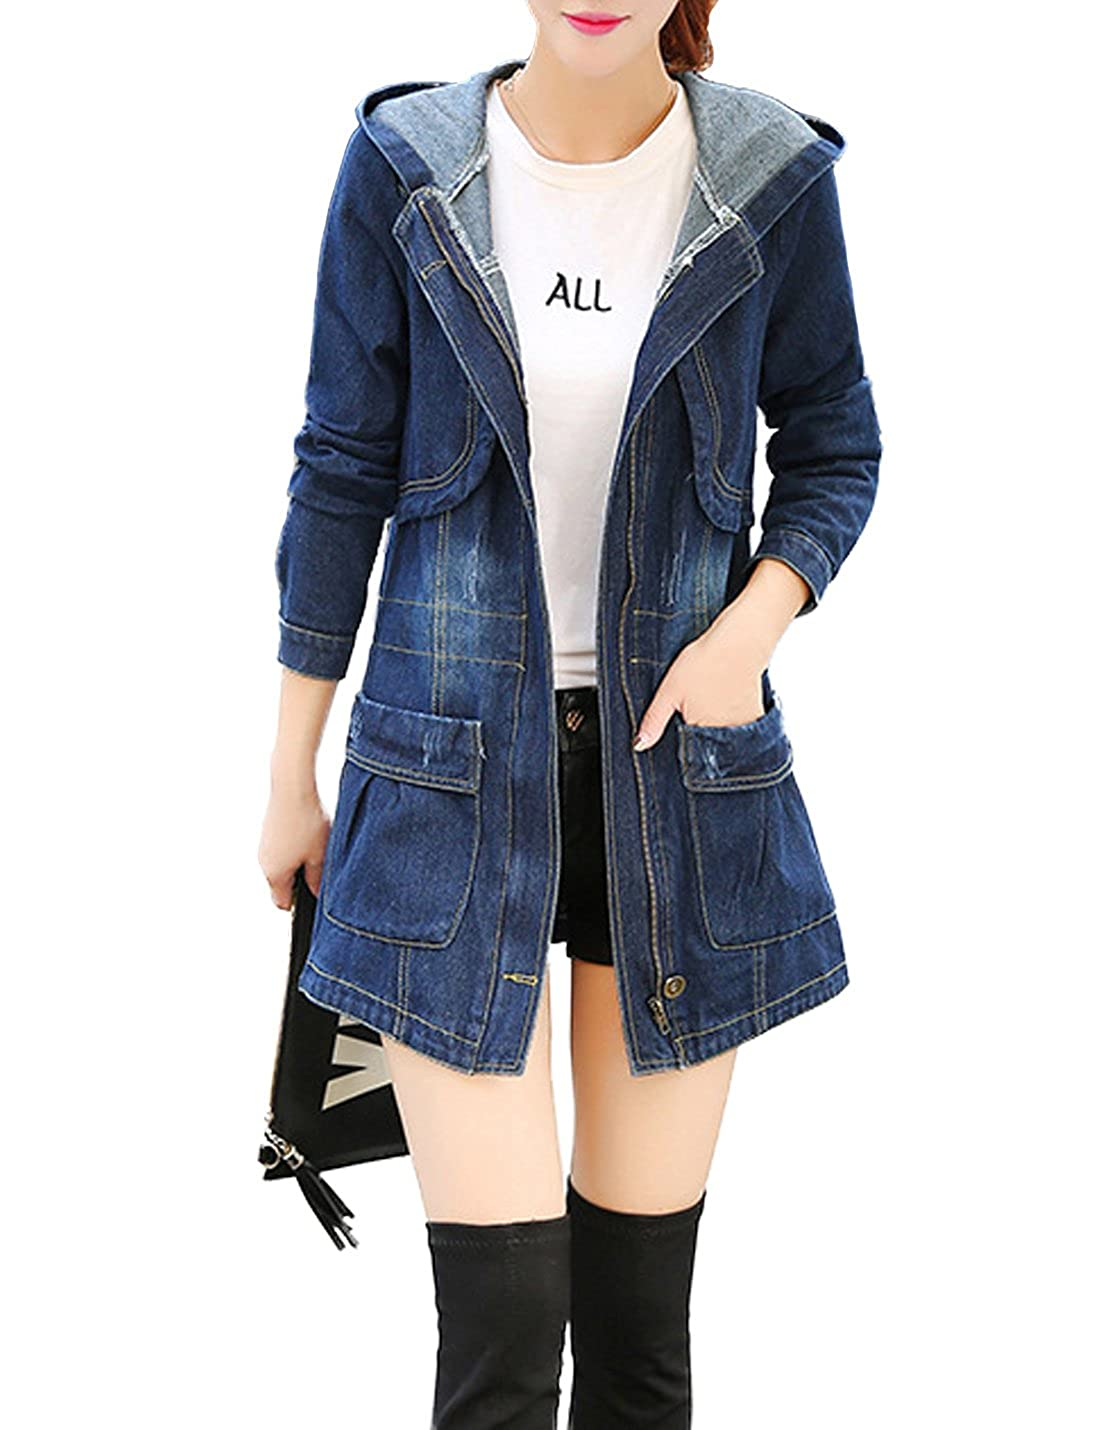 Tanming Women's Casual Mid-Long Hooded Denim Jacket Coat Tanming-100240